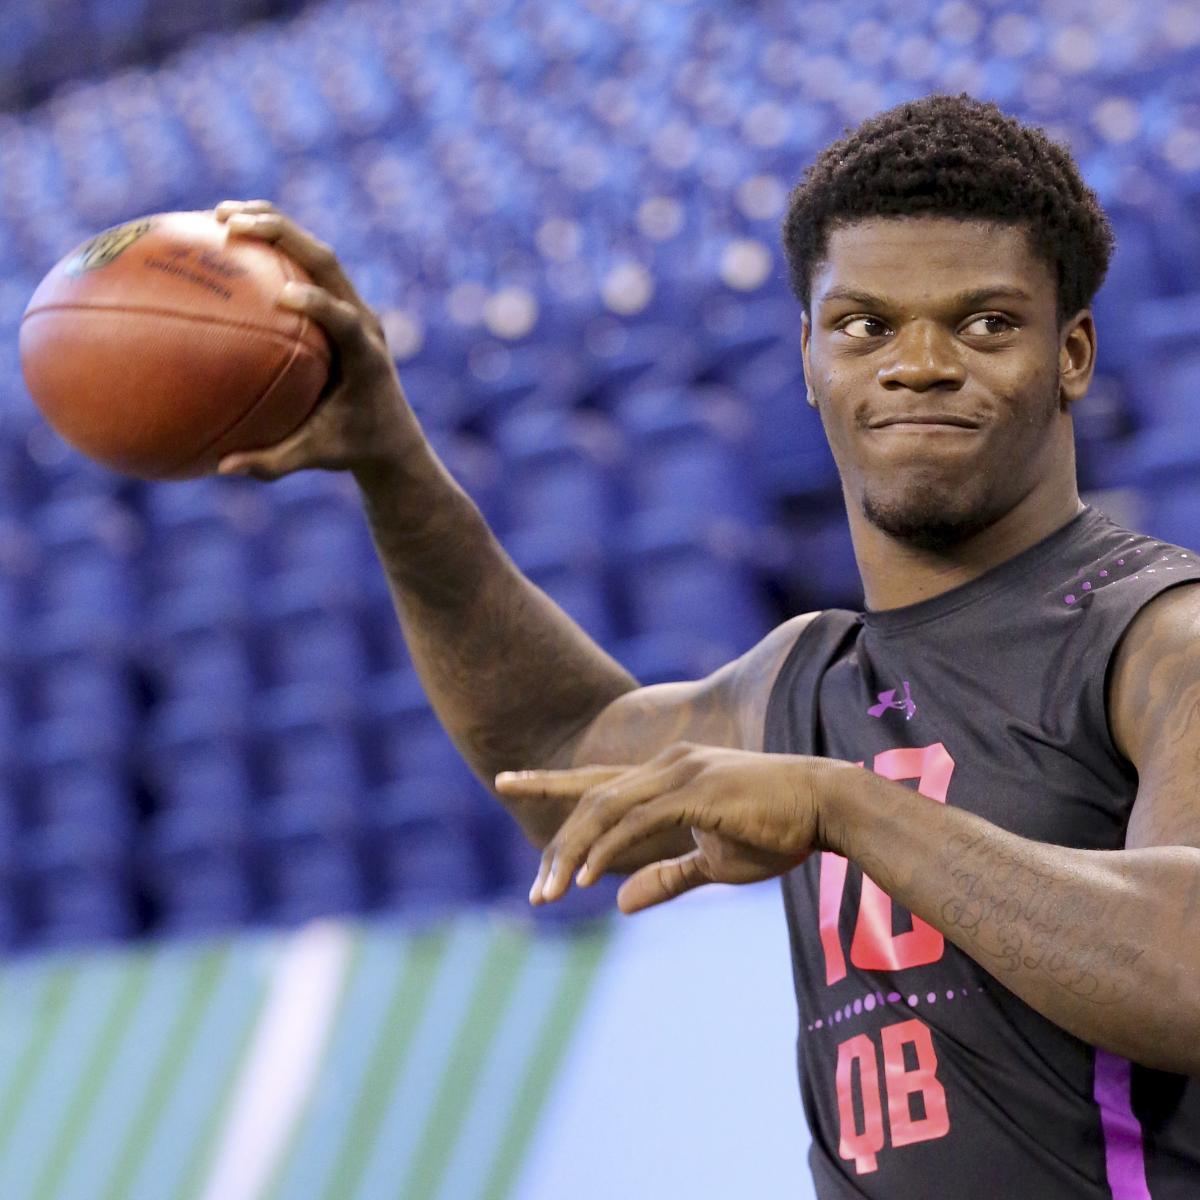 Lamar Jackson Rumors: QB's 2018 NFL Draft Stock 'Continues